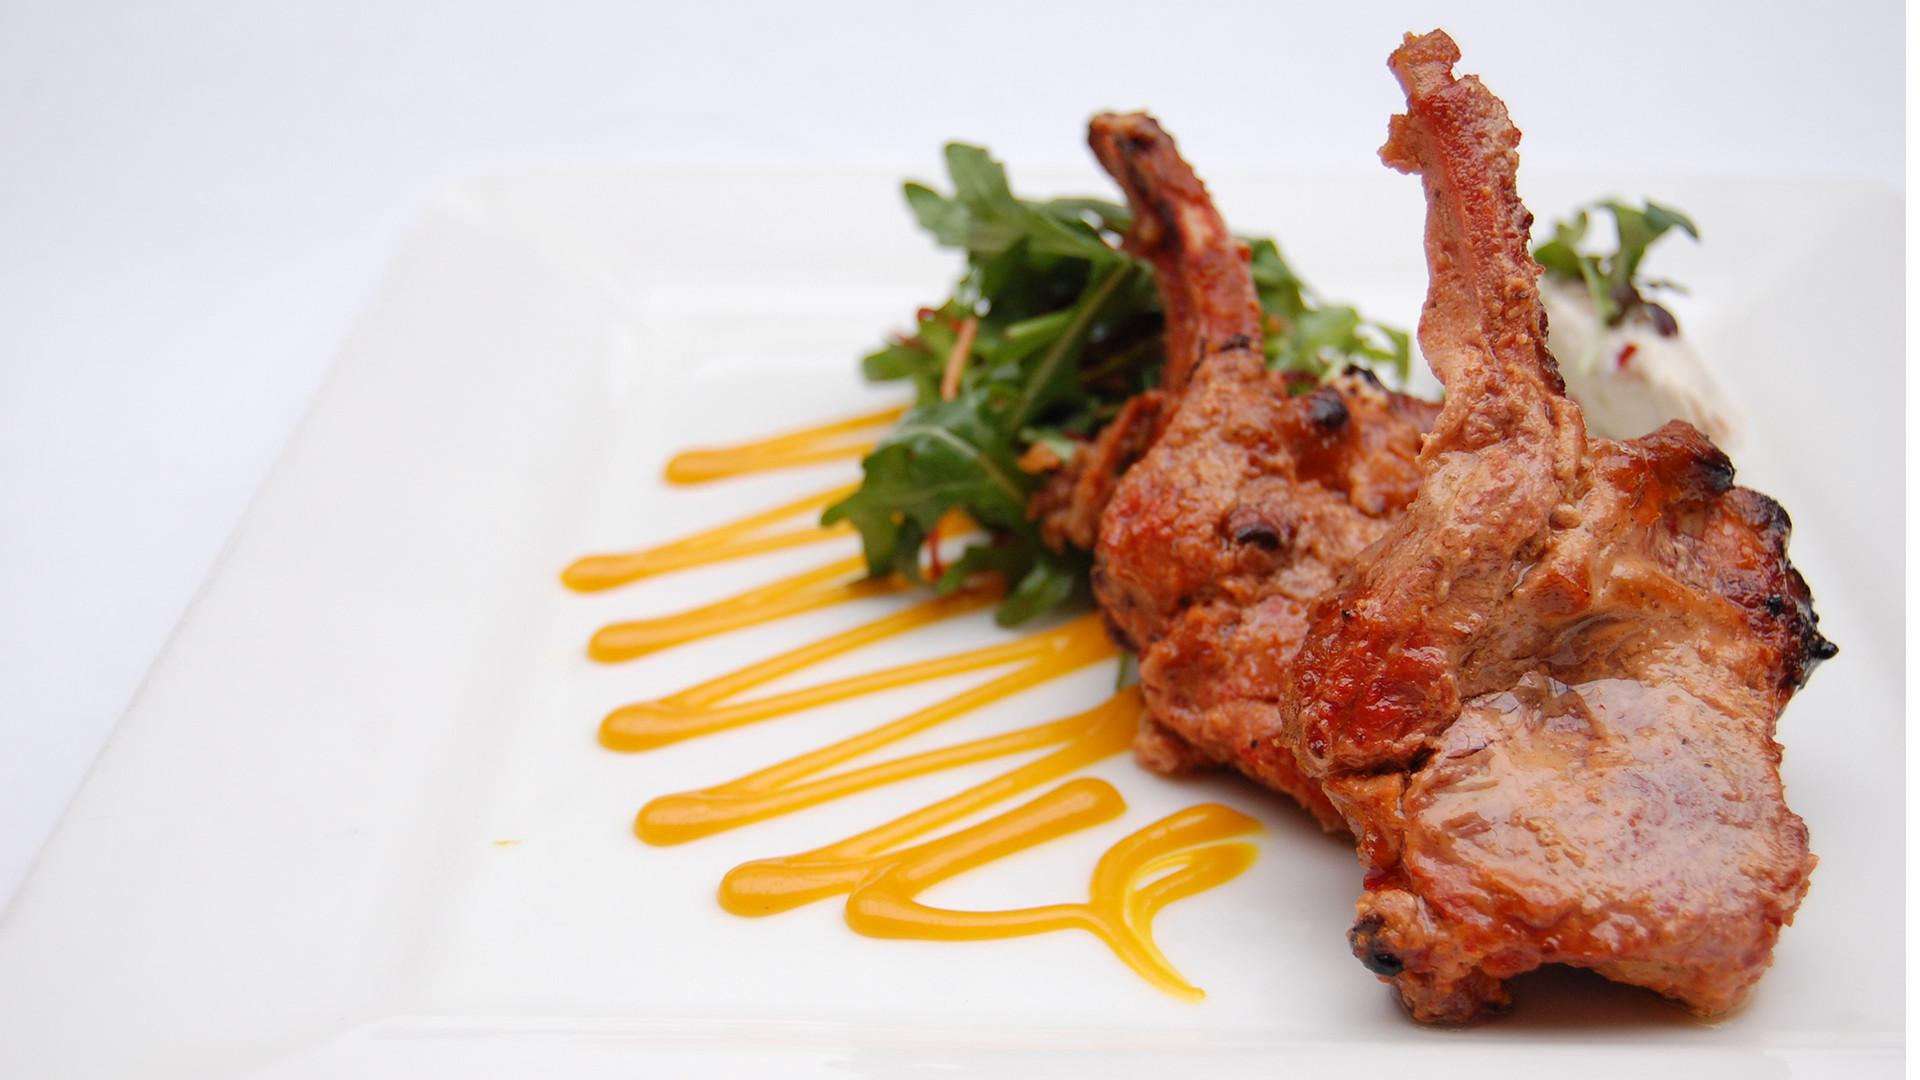 Clove smoked lamb chops with garlic yoghurt at Babur